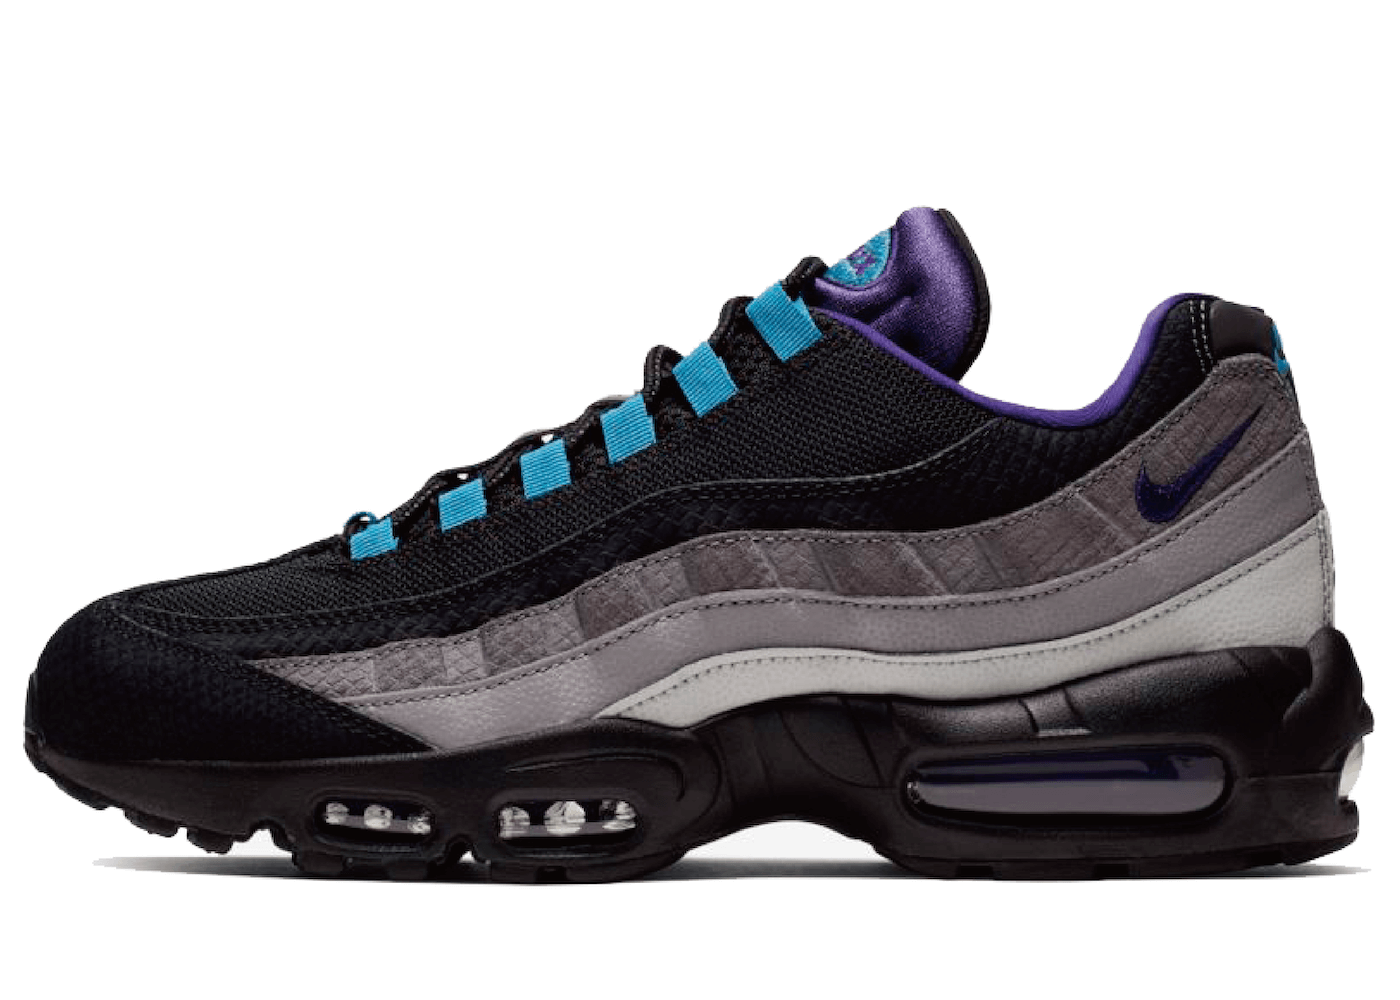 Nike Air Max 95 Black Court Purpleの写真